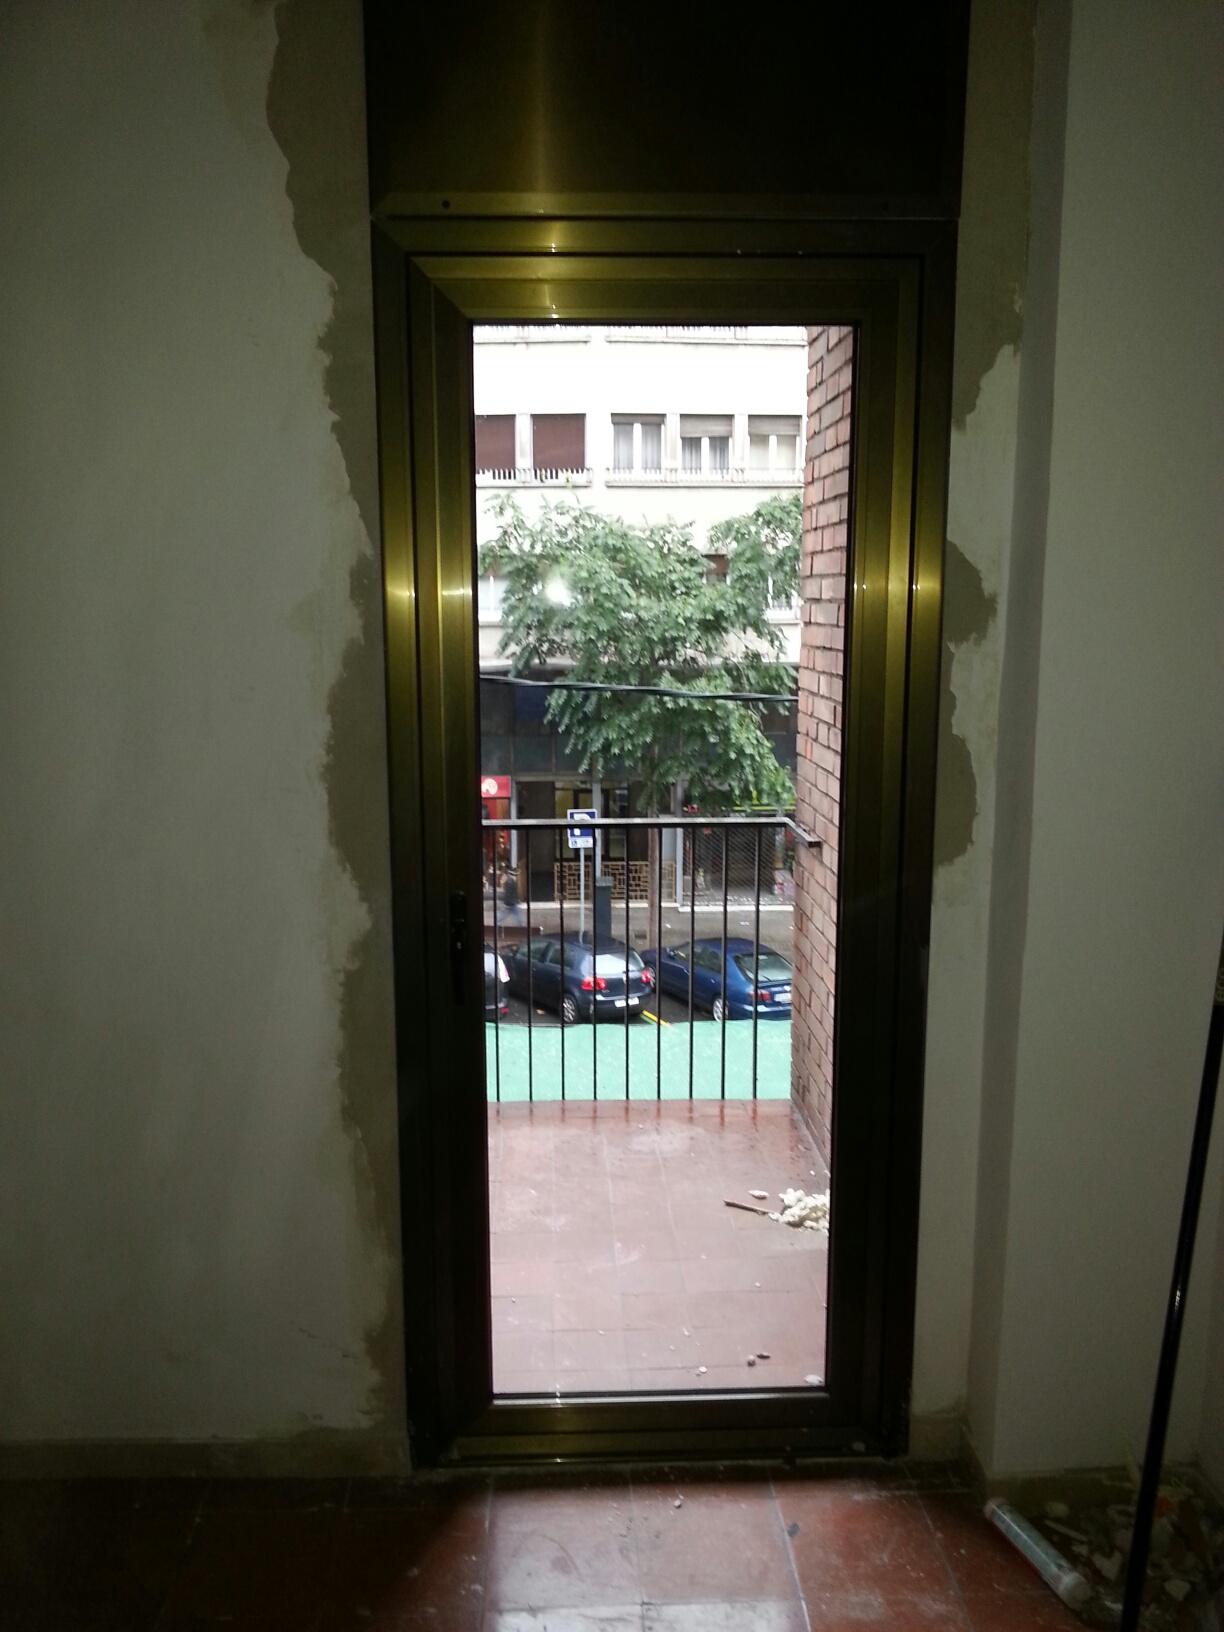 Puertas de aluminio con cristal para exterior trendy for Puerta corredera aluminio exterior